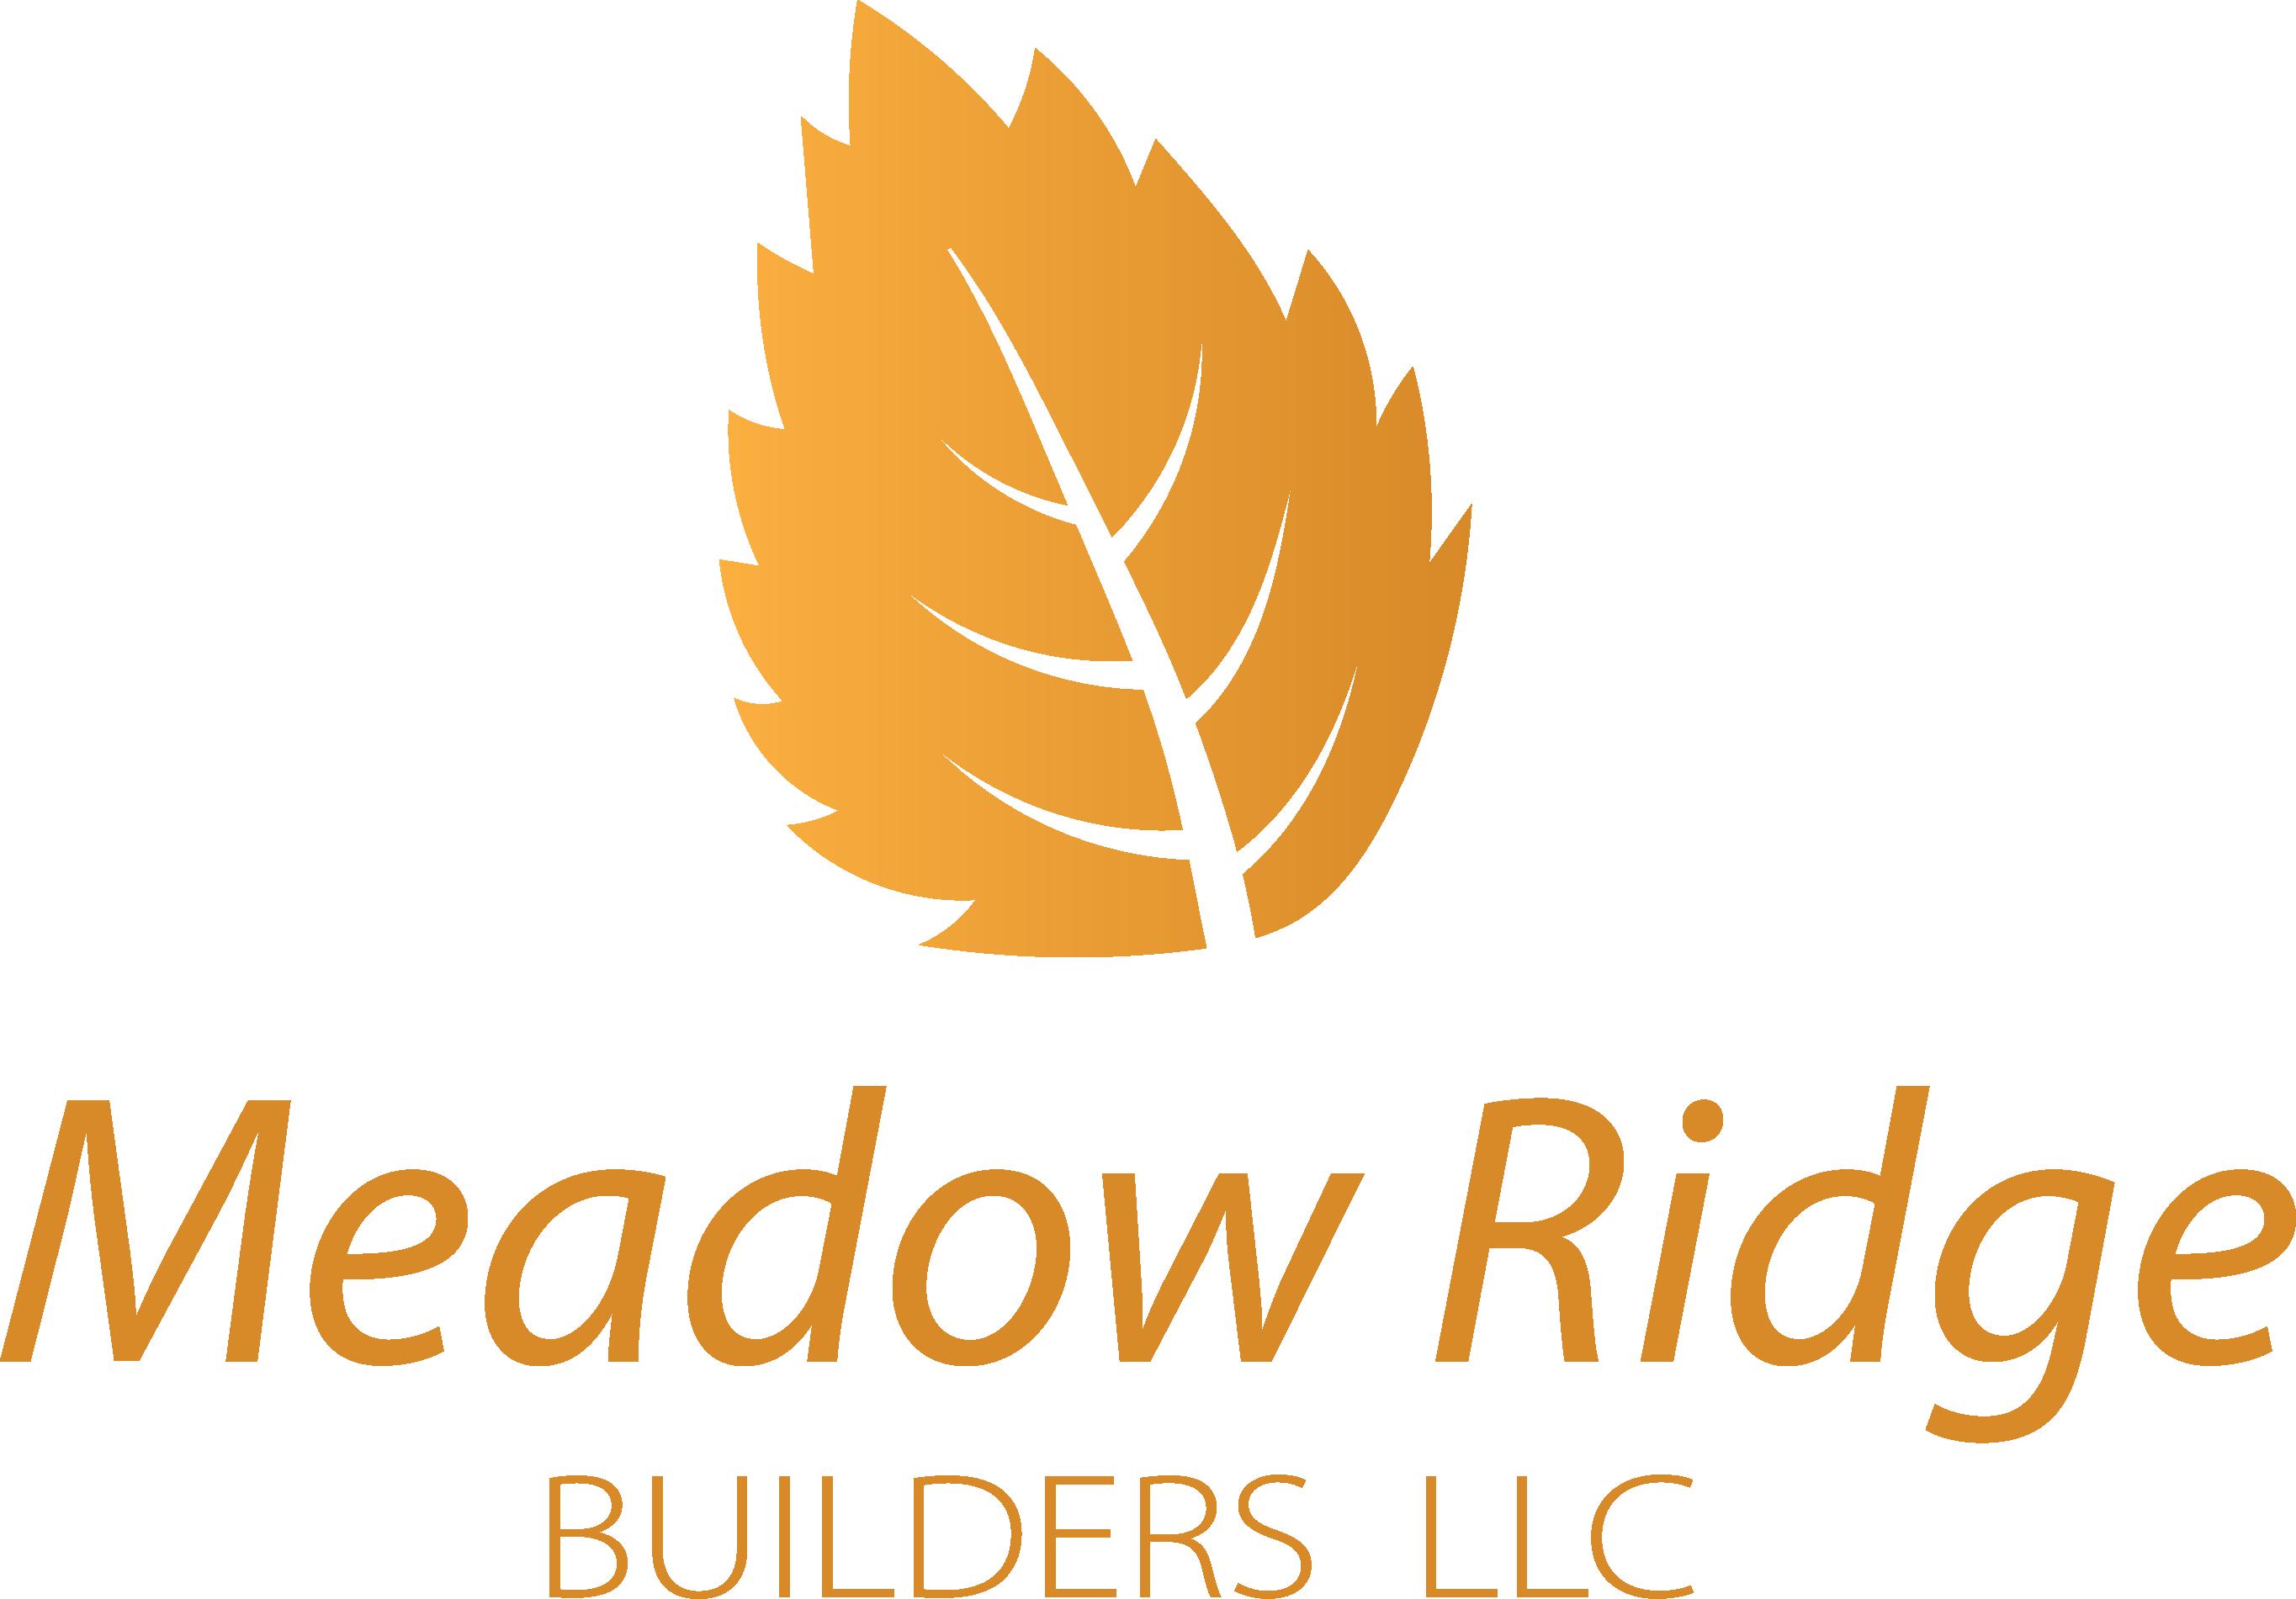 Meadow Ridge Builders_Primary Logo